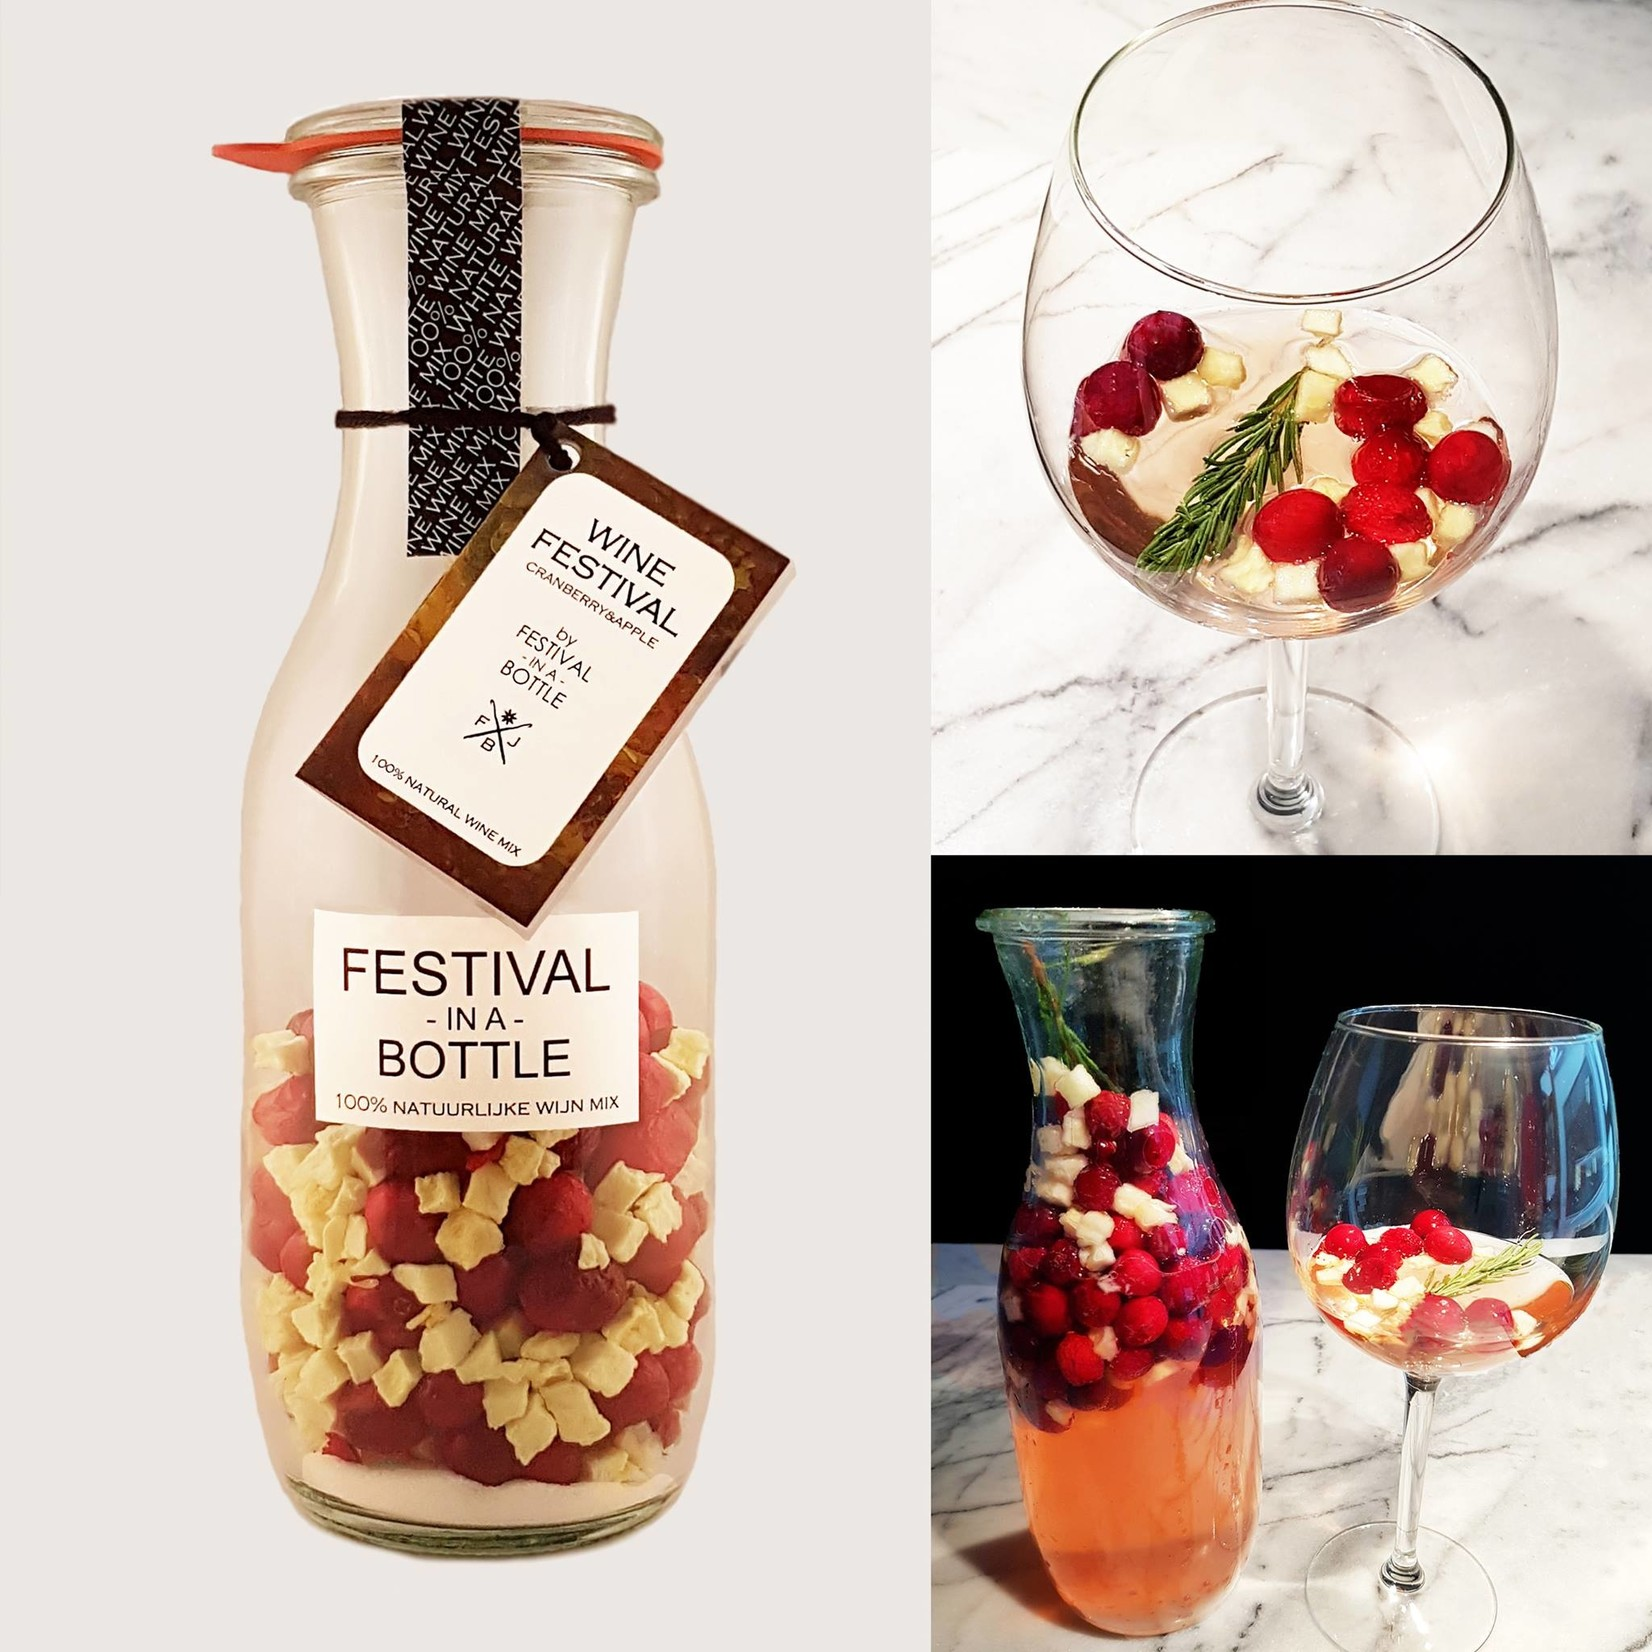 Festival in a bottle Wine festival - Cranberry & Apple